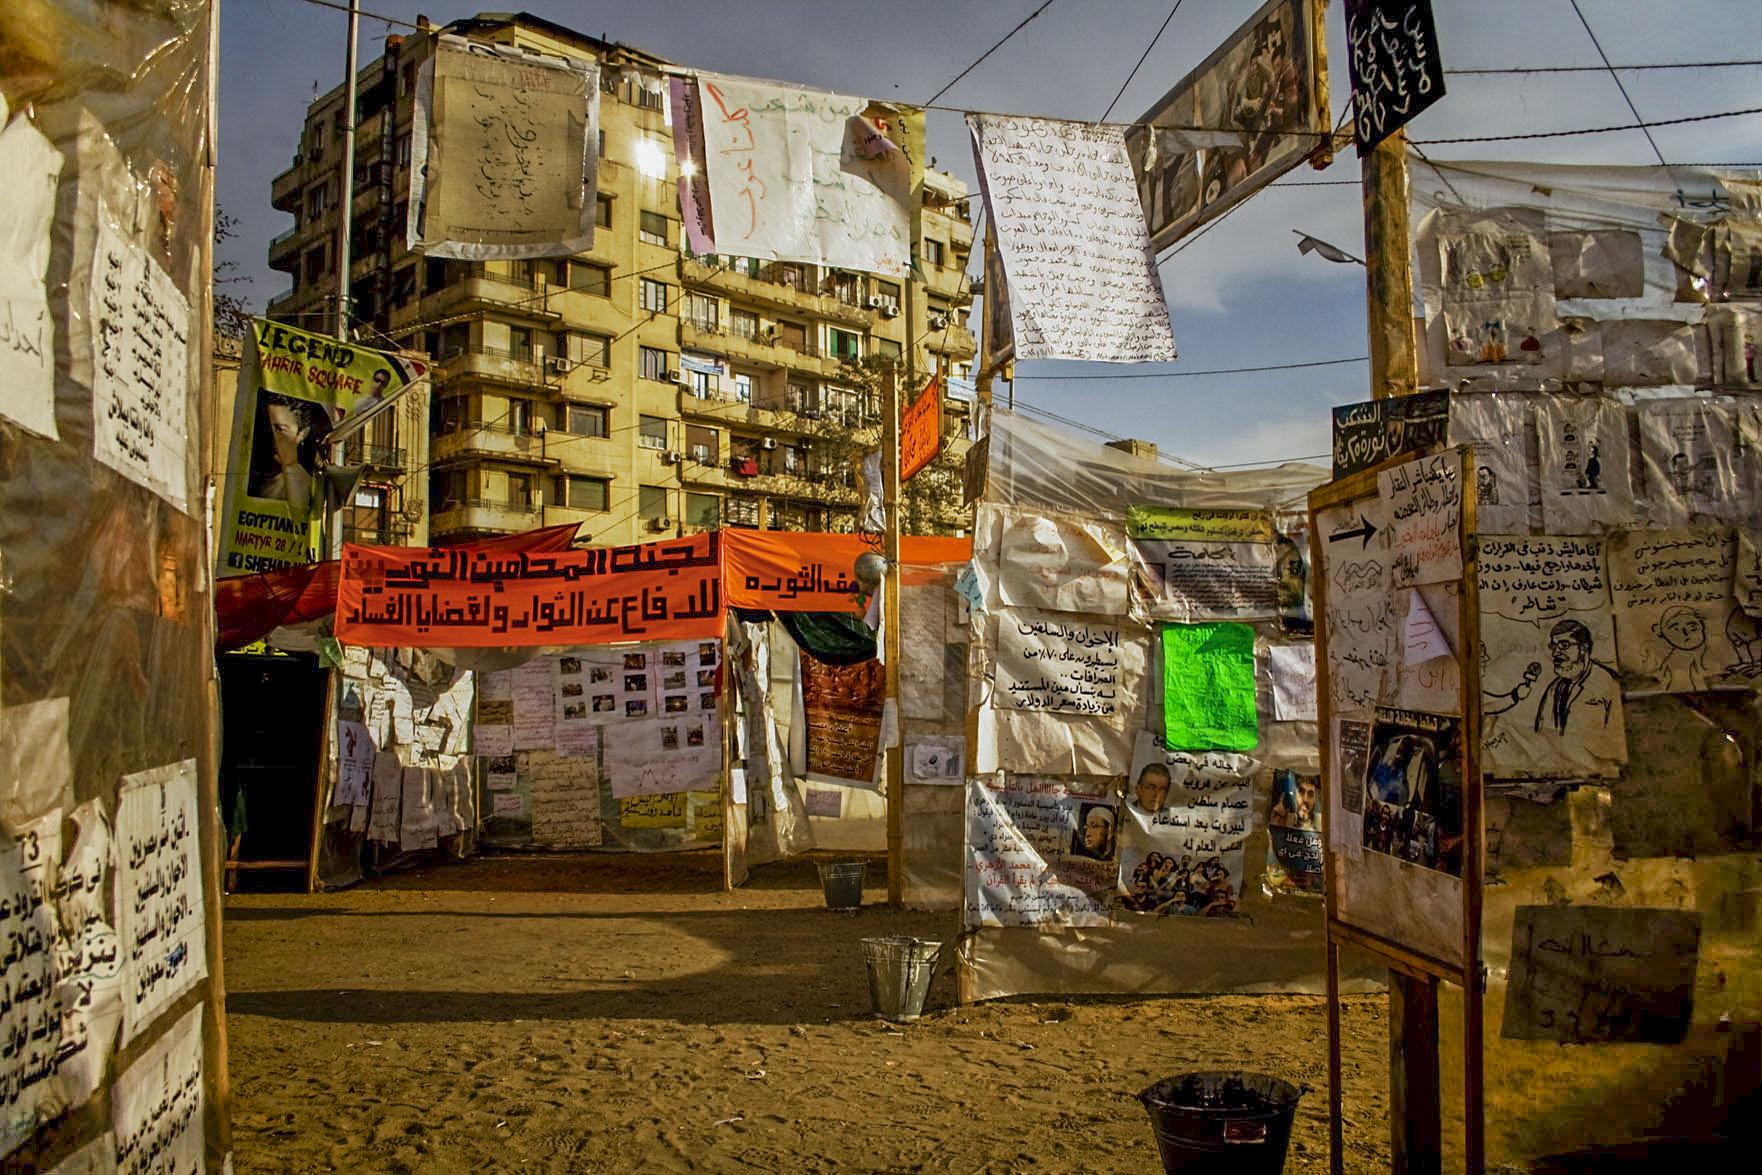 Tahrir Square,Cairo, Egypt